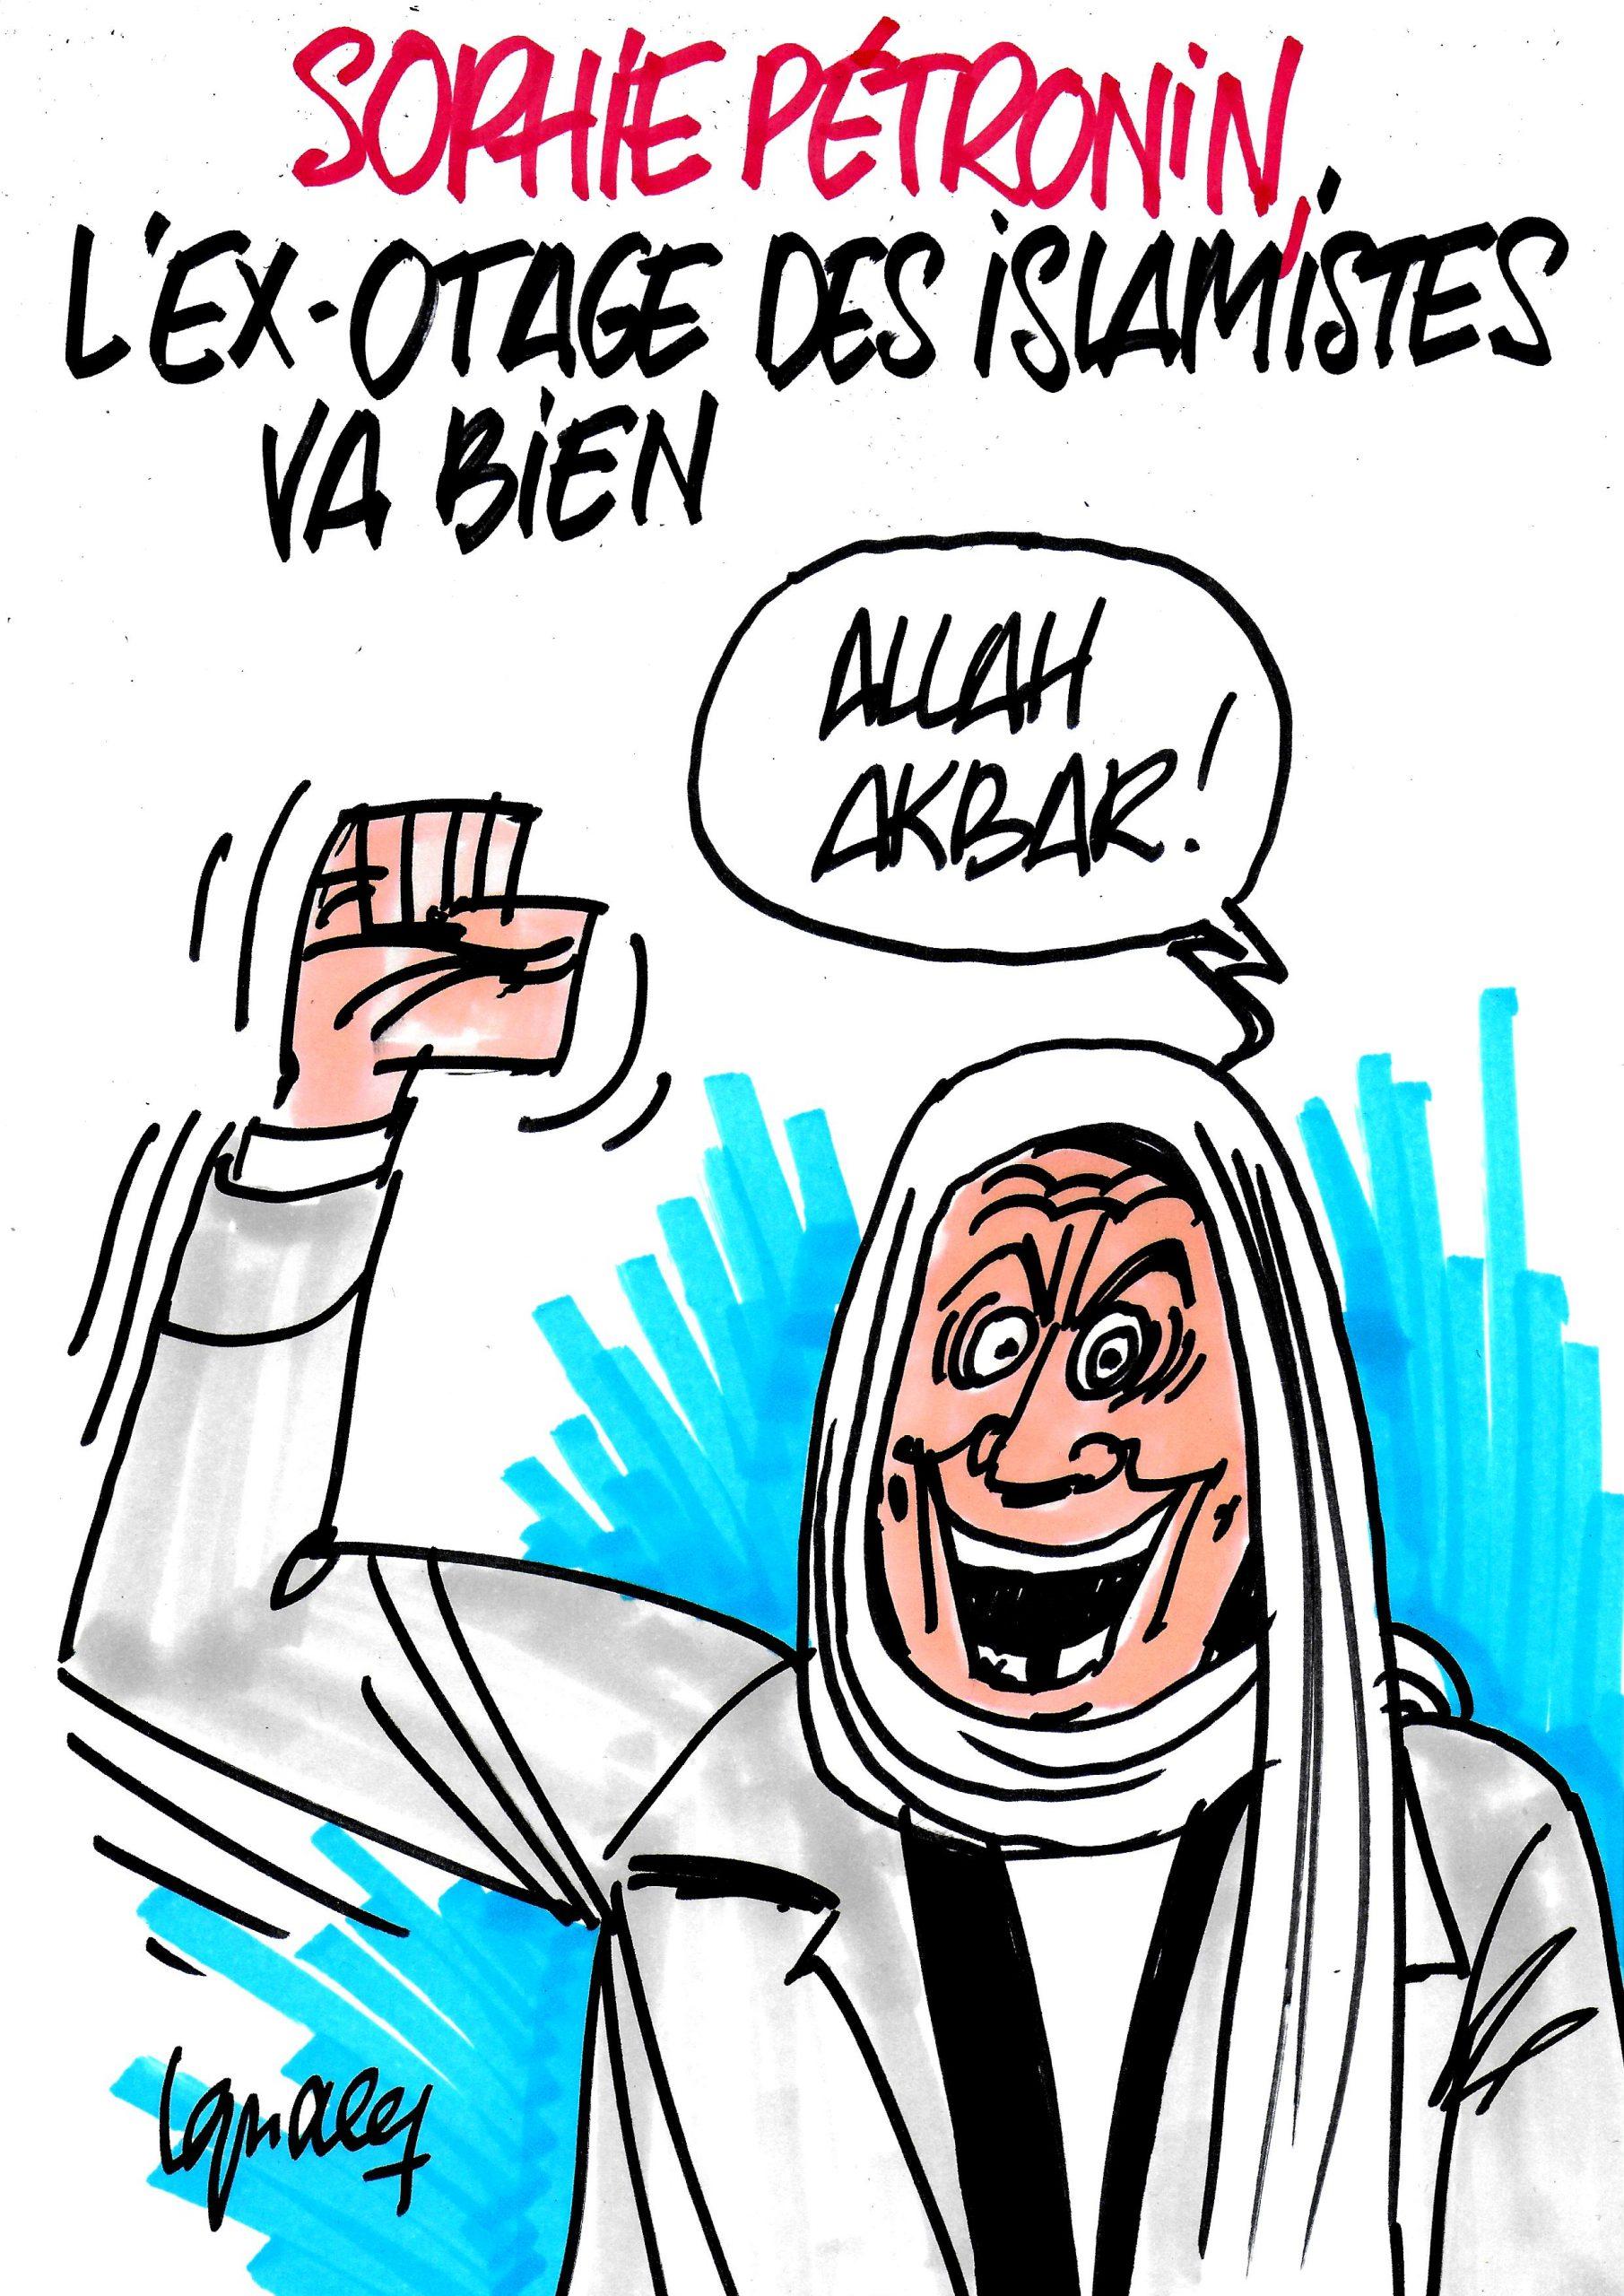 Ignace - L'ex-otage des islamistes va bien